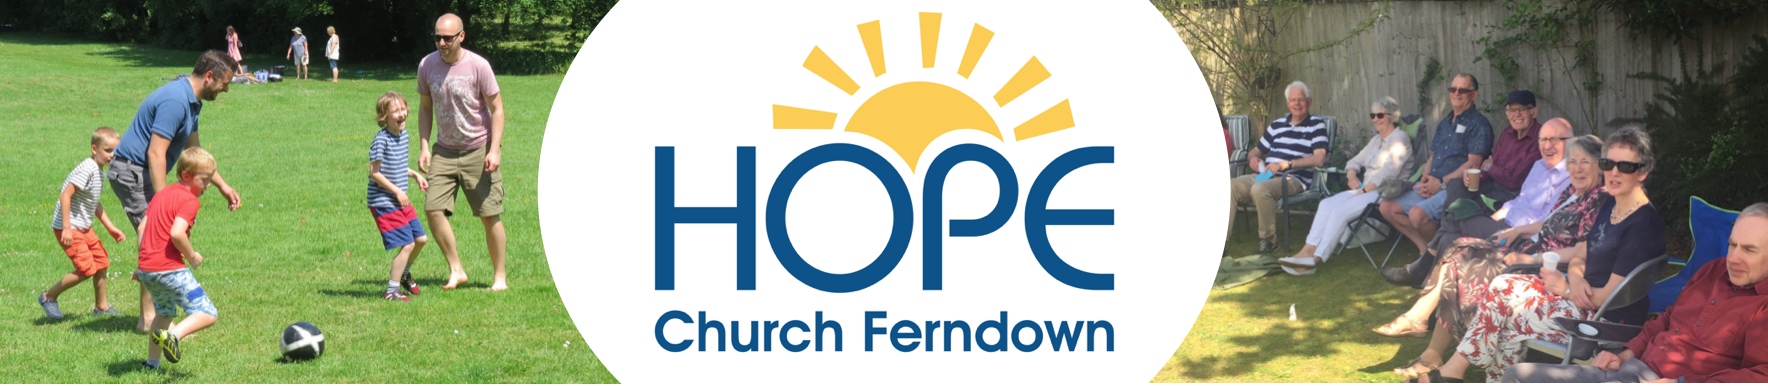 HOPE CHURCH FERNDOWN